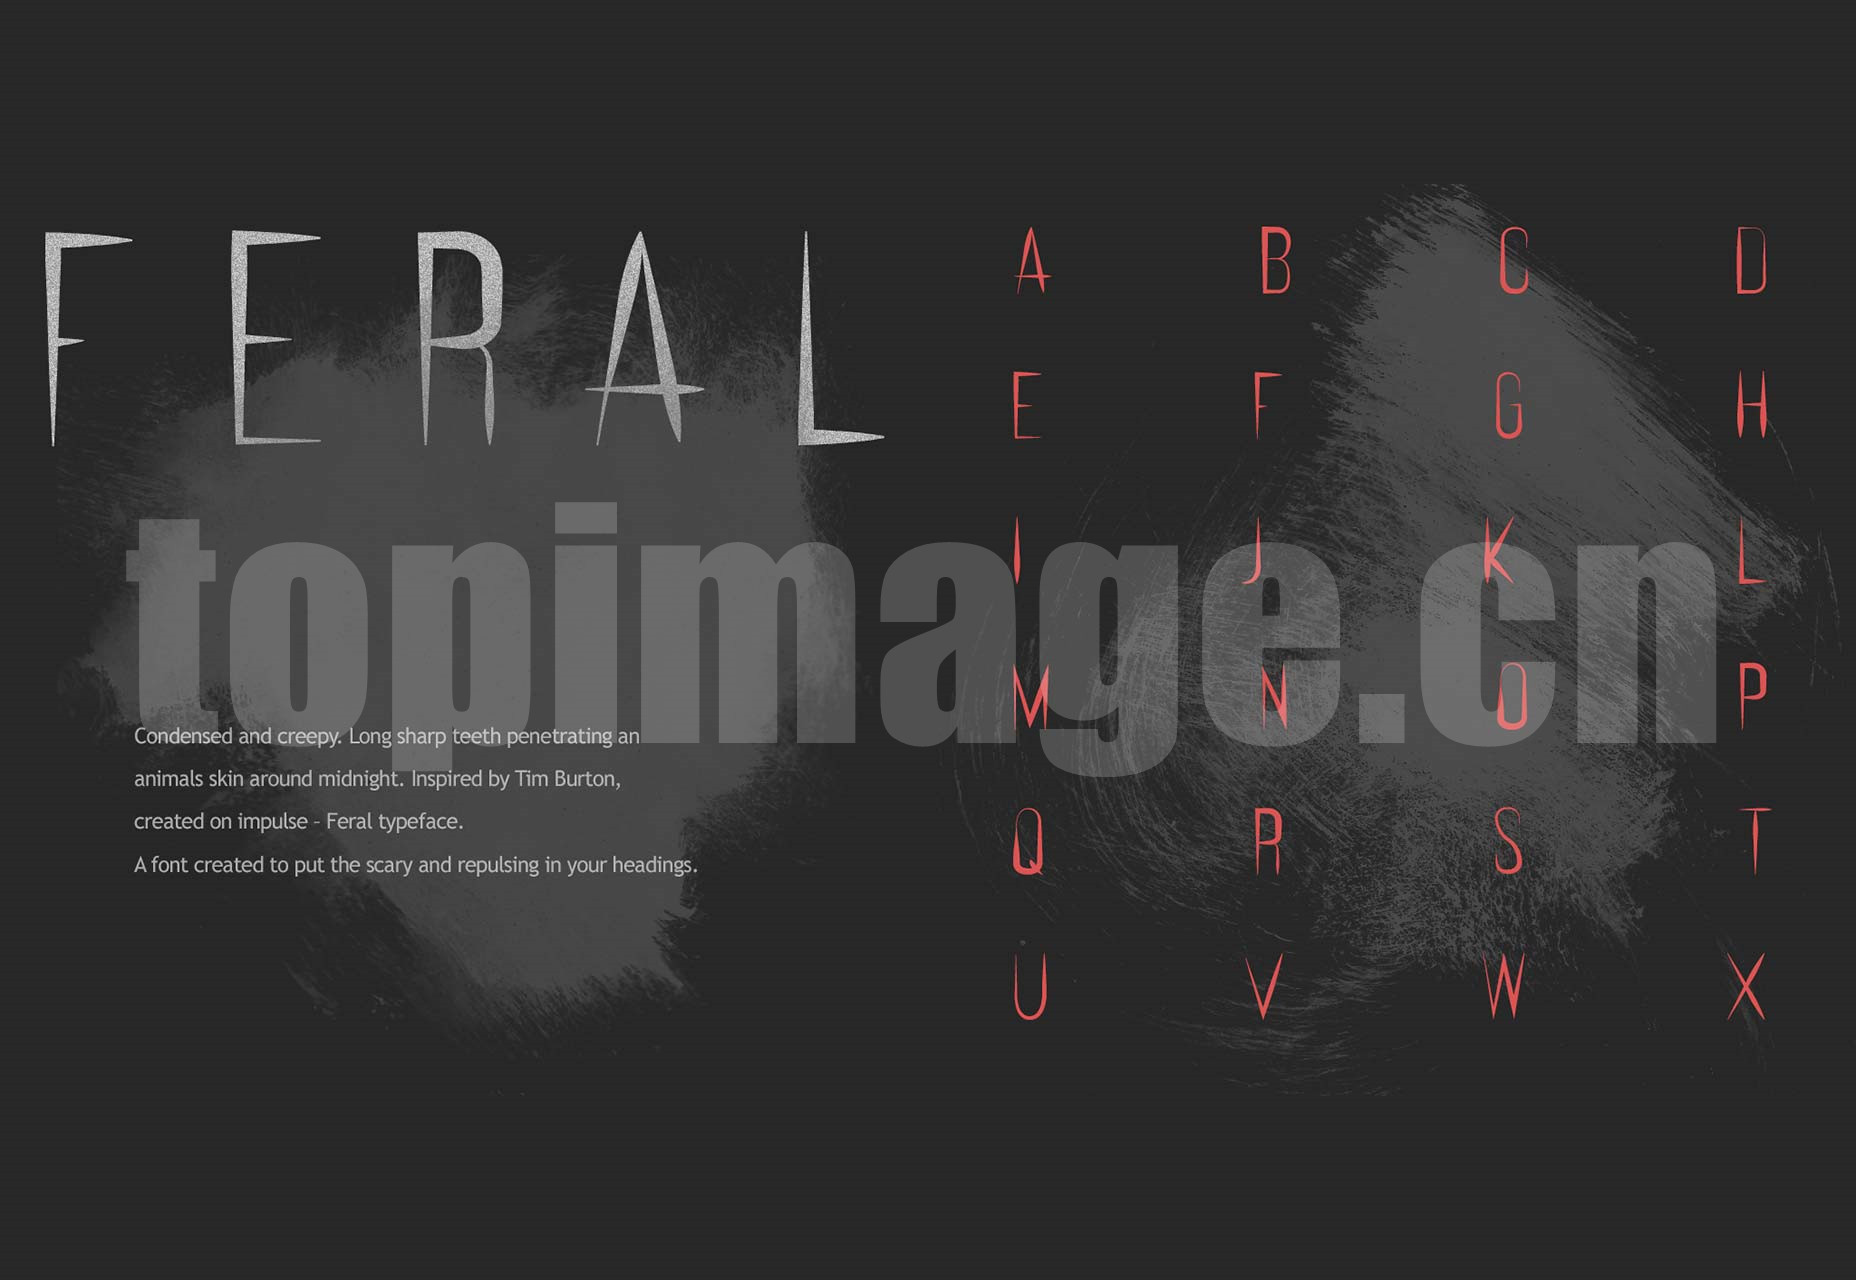 Feral哥特风 创意电影海报 英文logo字体下载